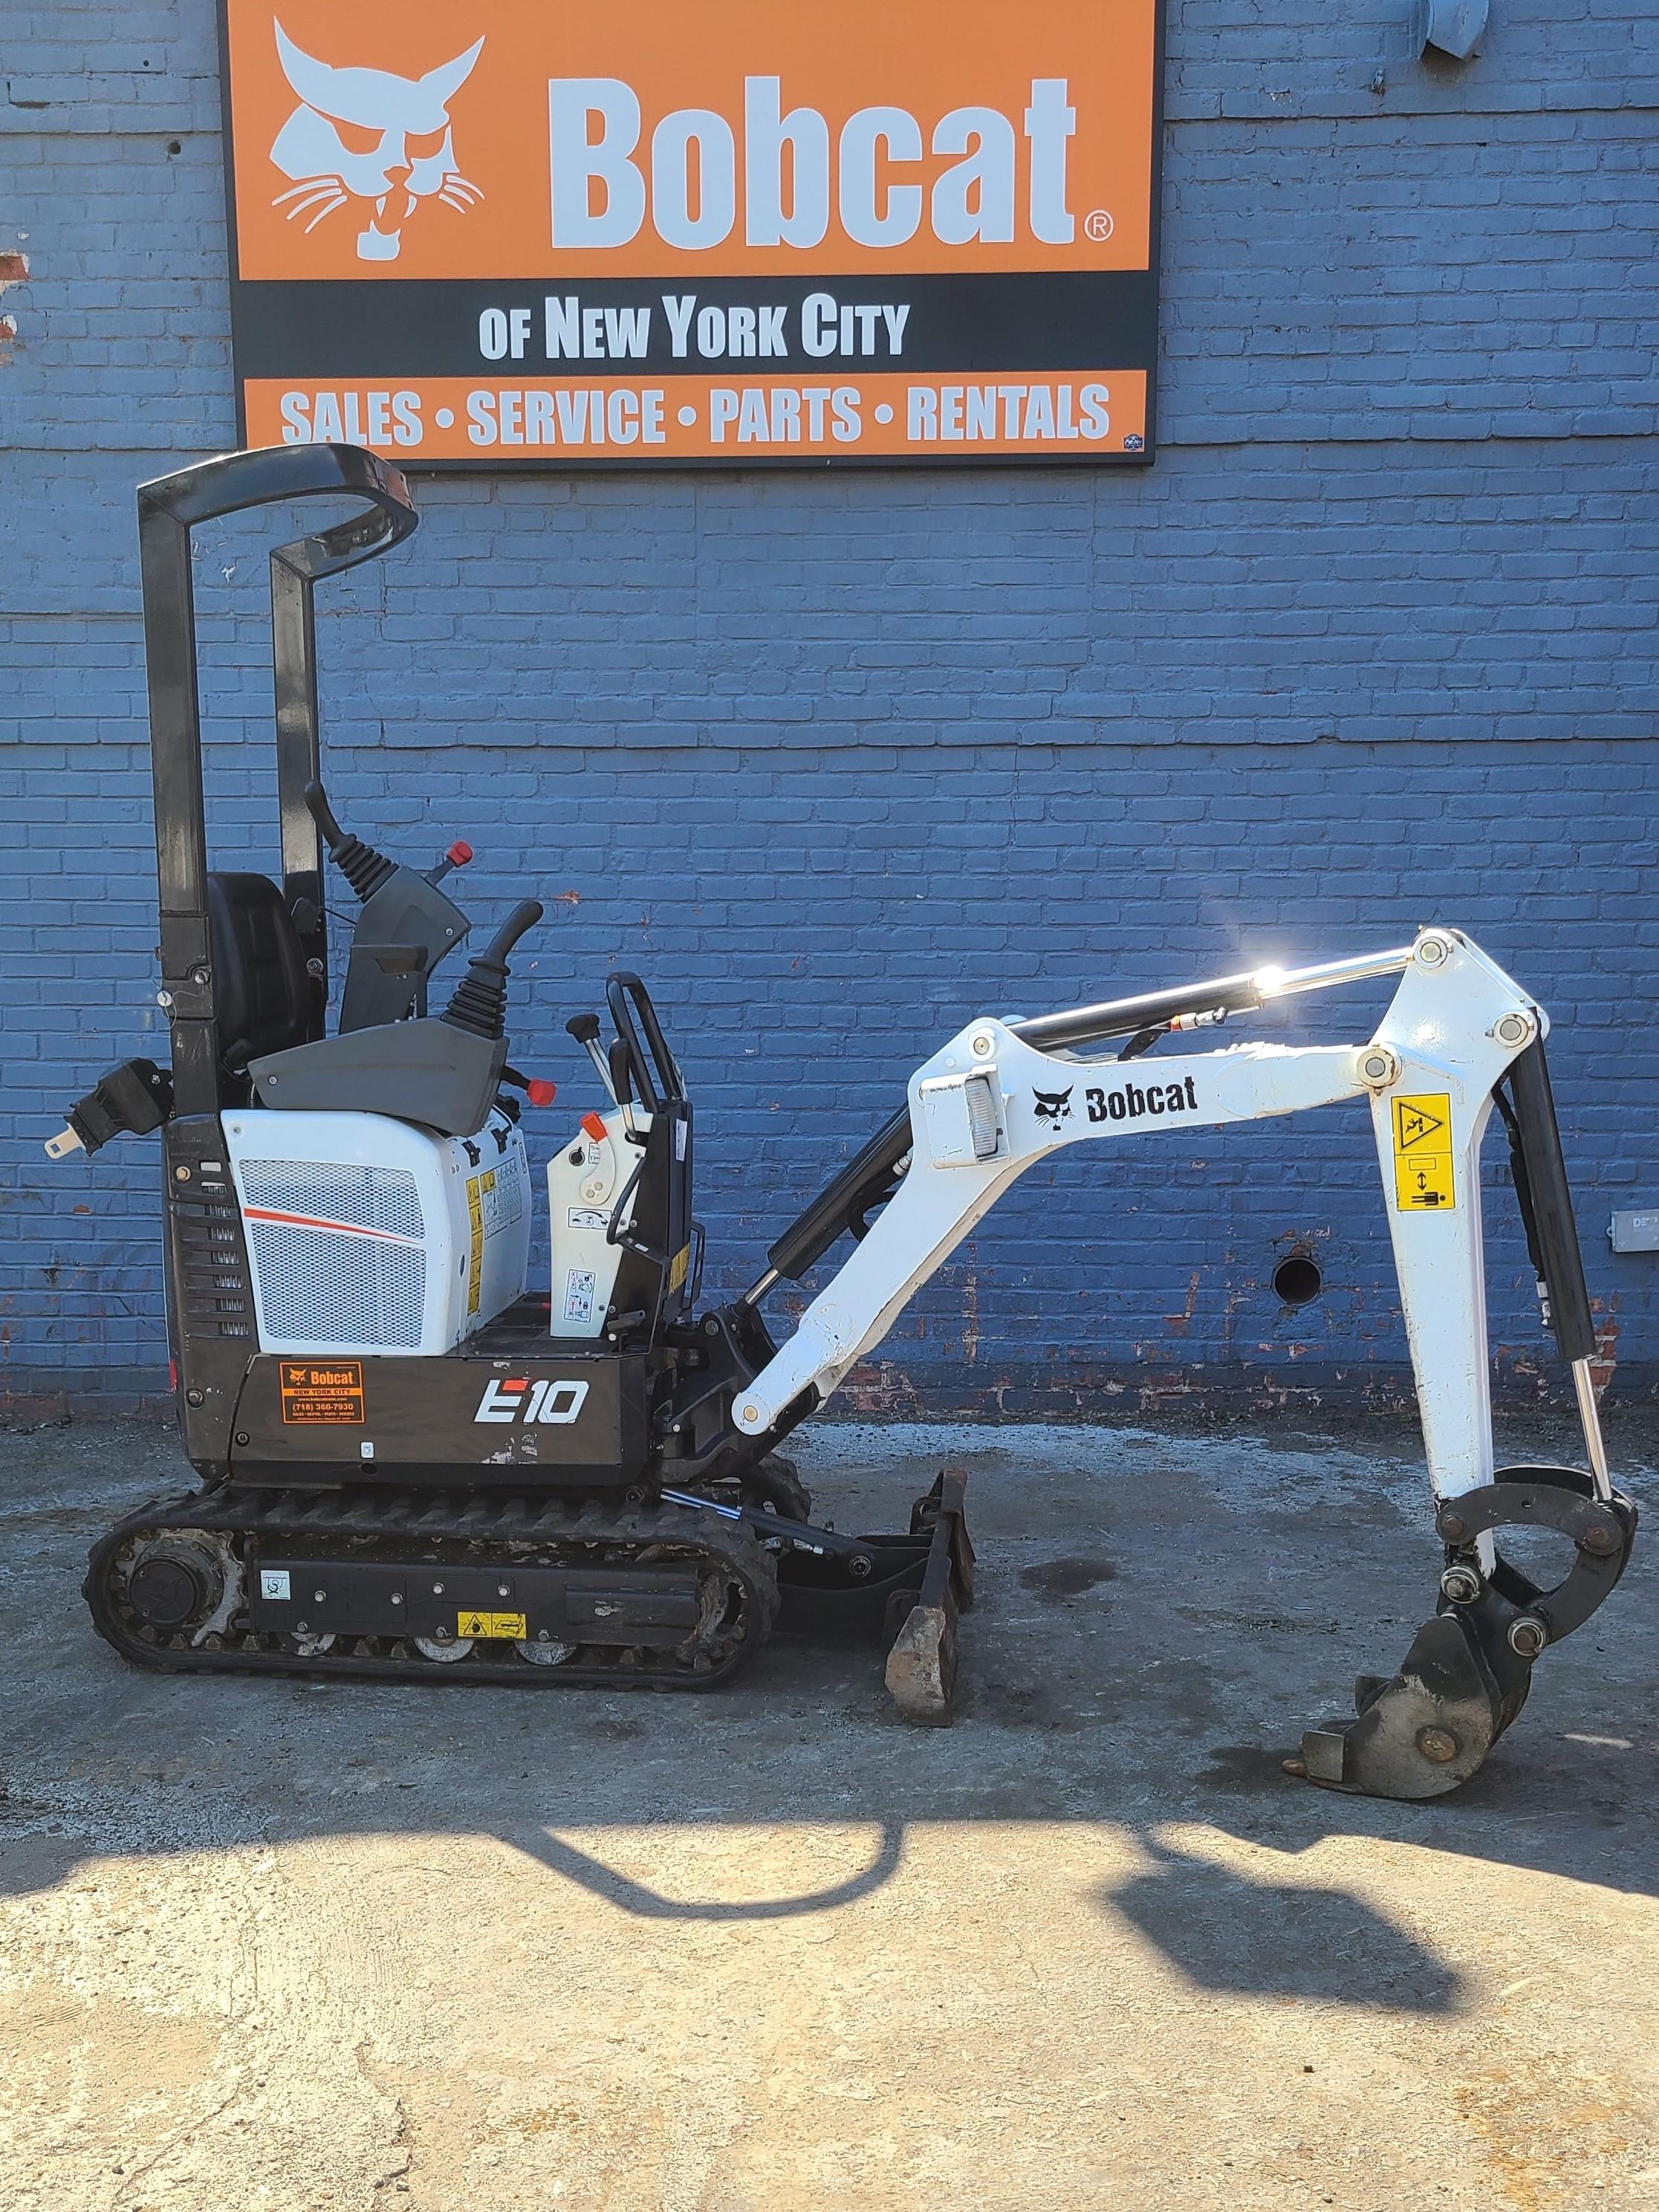 Used, 2019, Bobcat, E10, Excavators